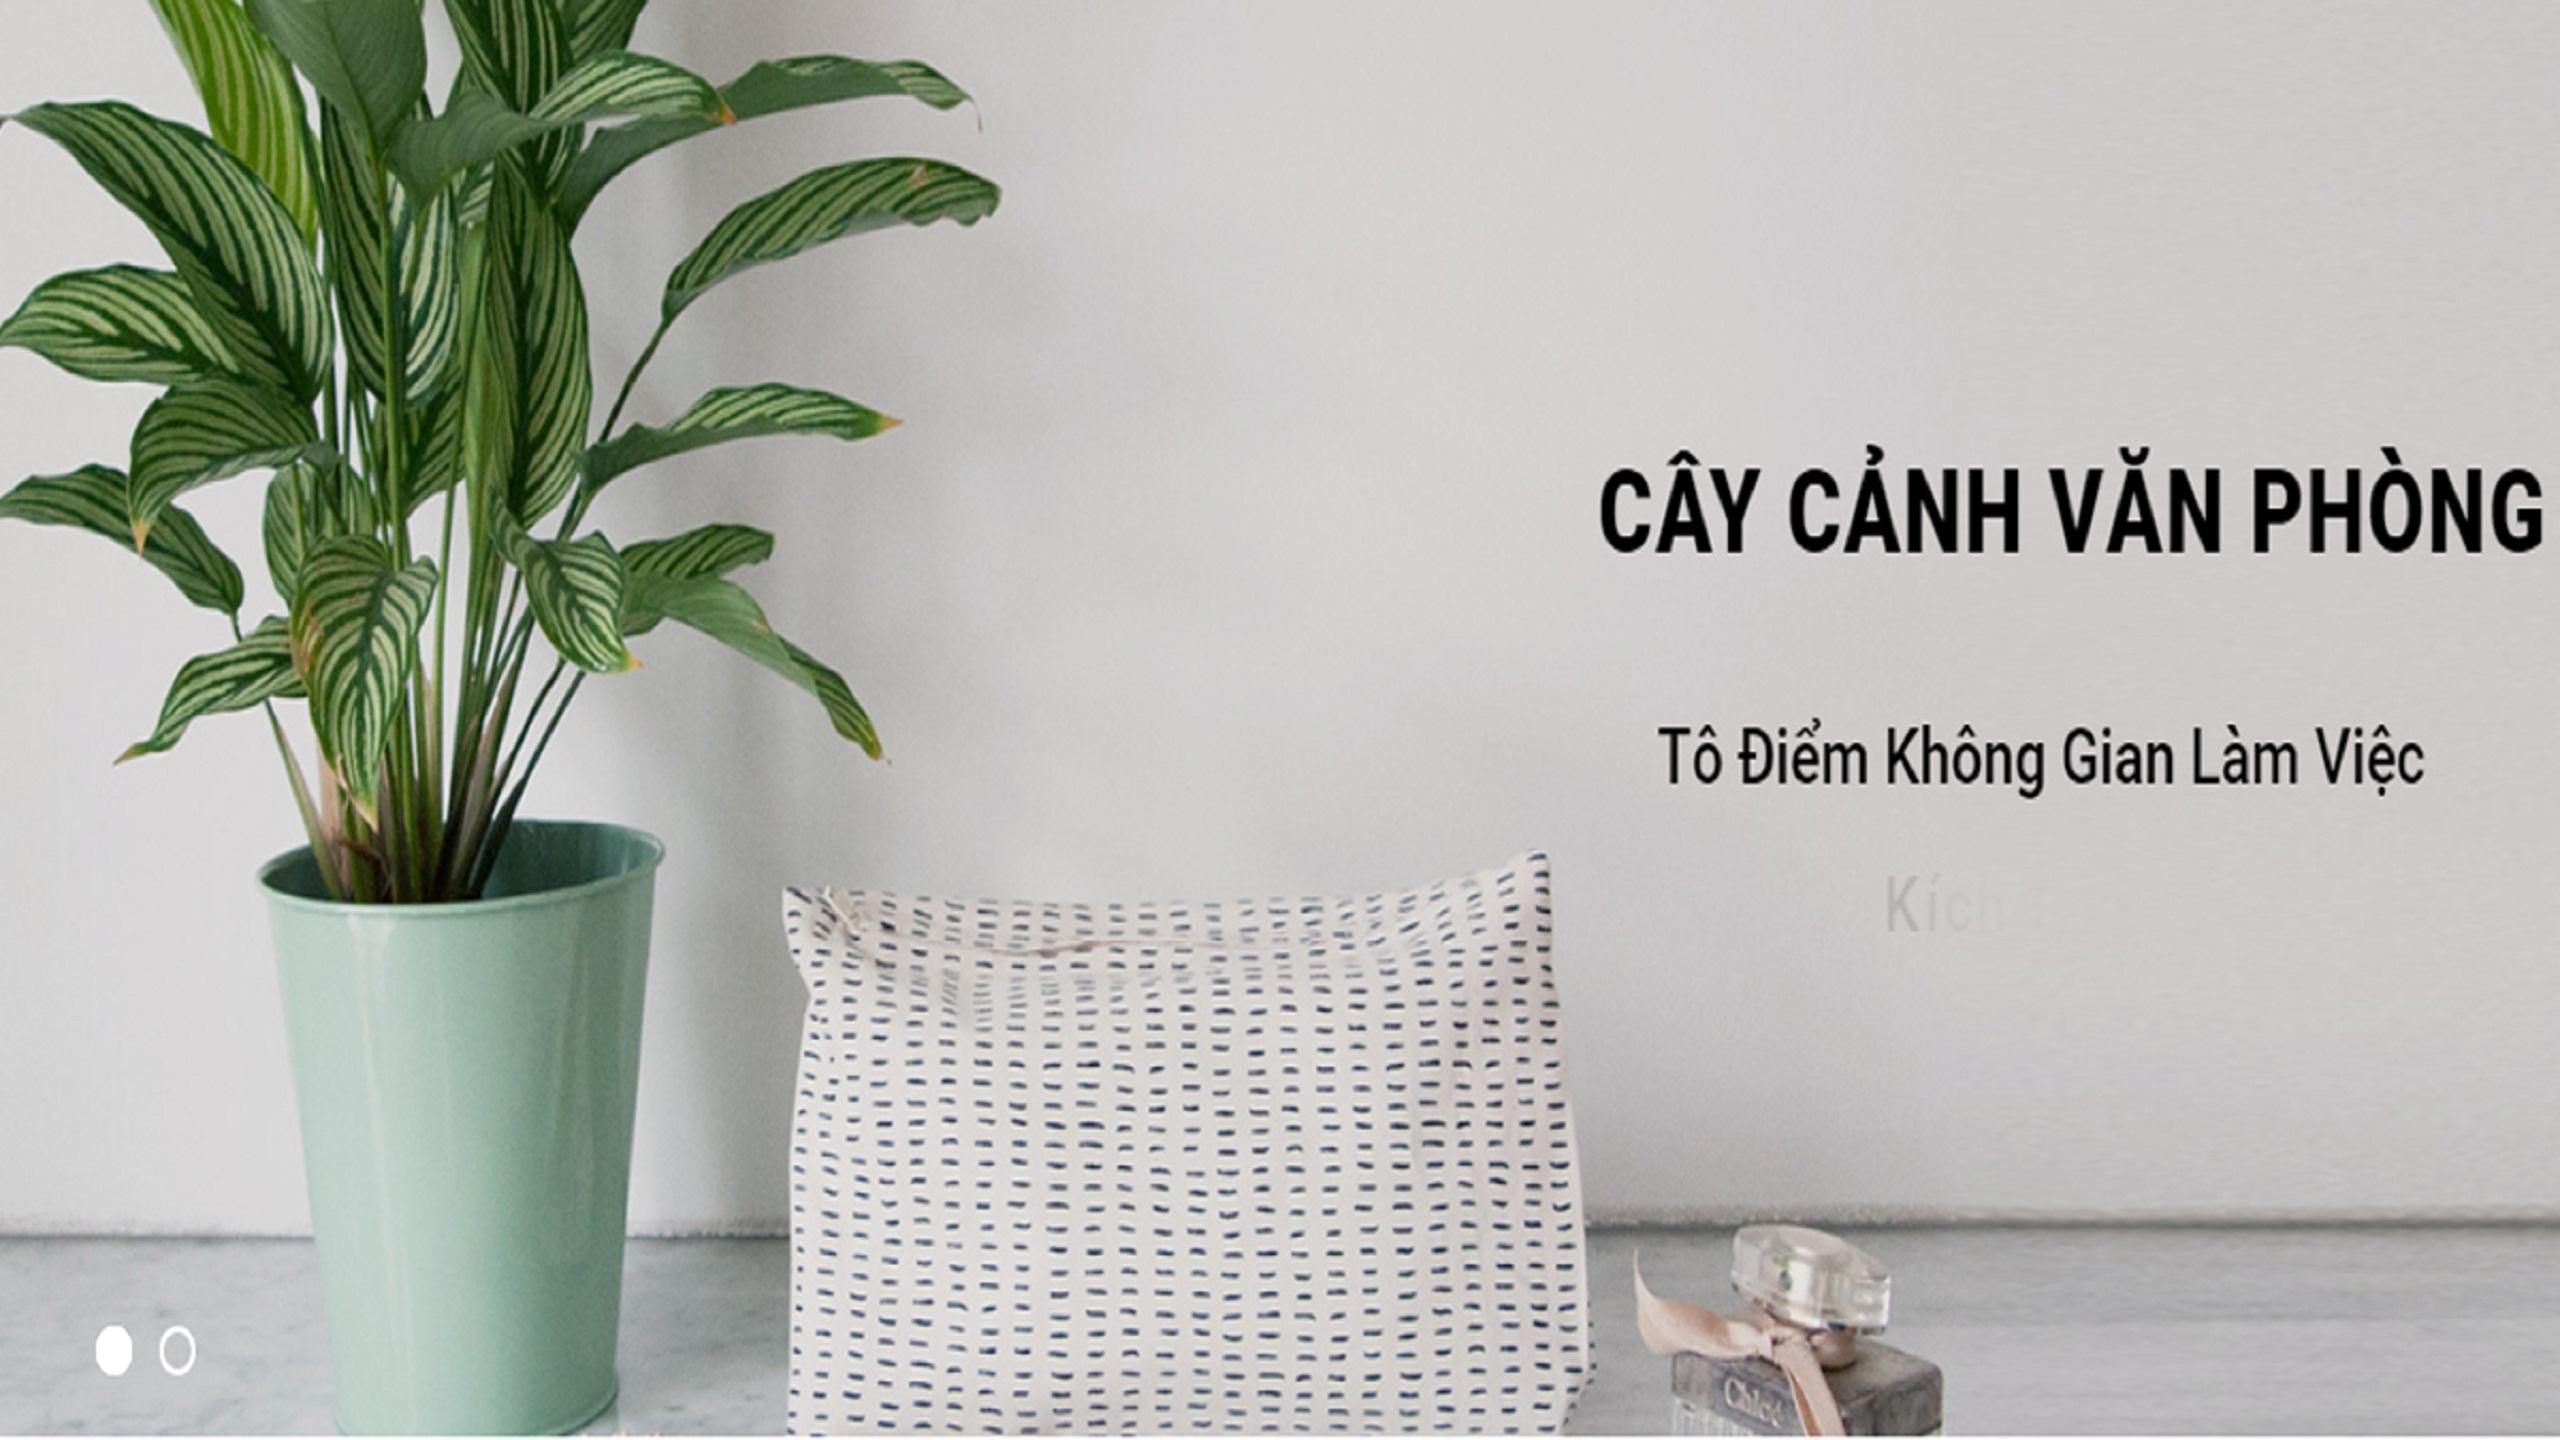 Thế Giới Cây Việt (@thegioicayviet) Cover Image